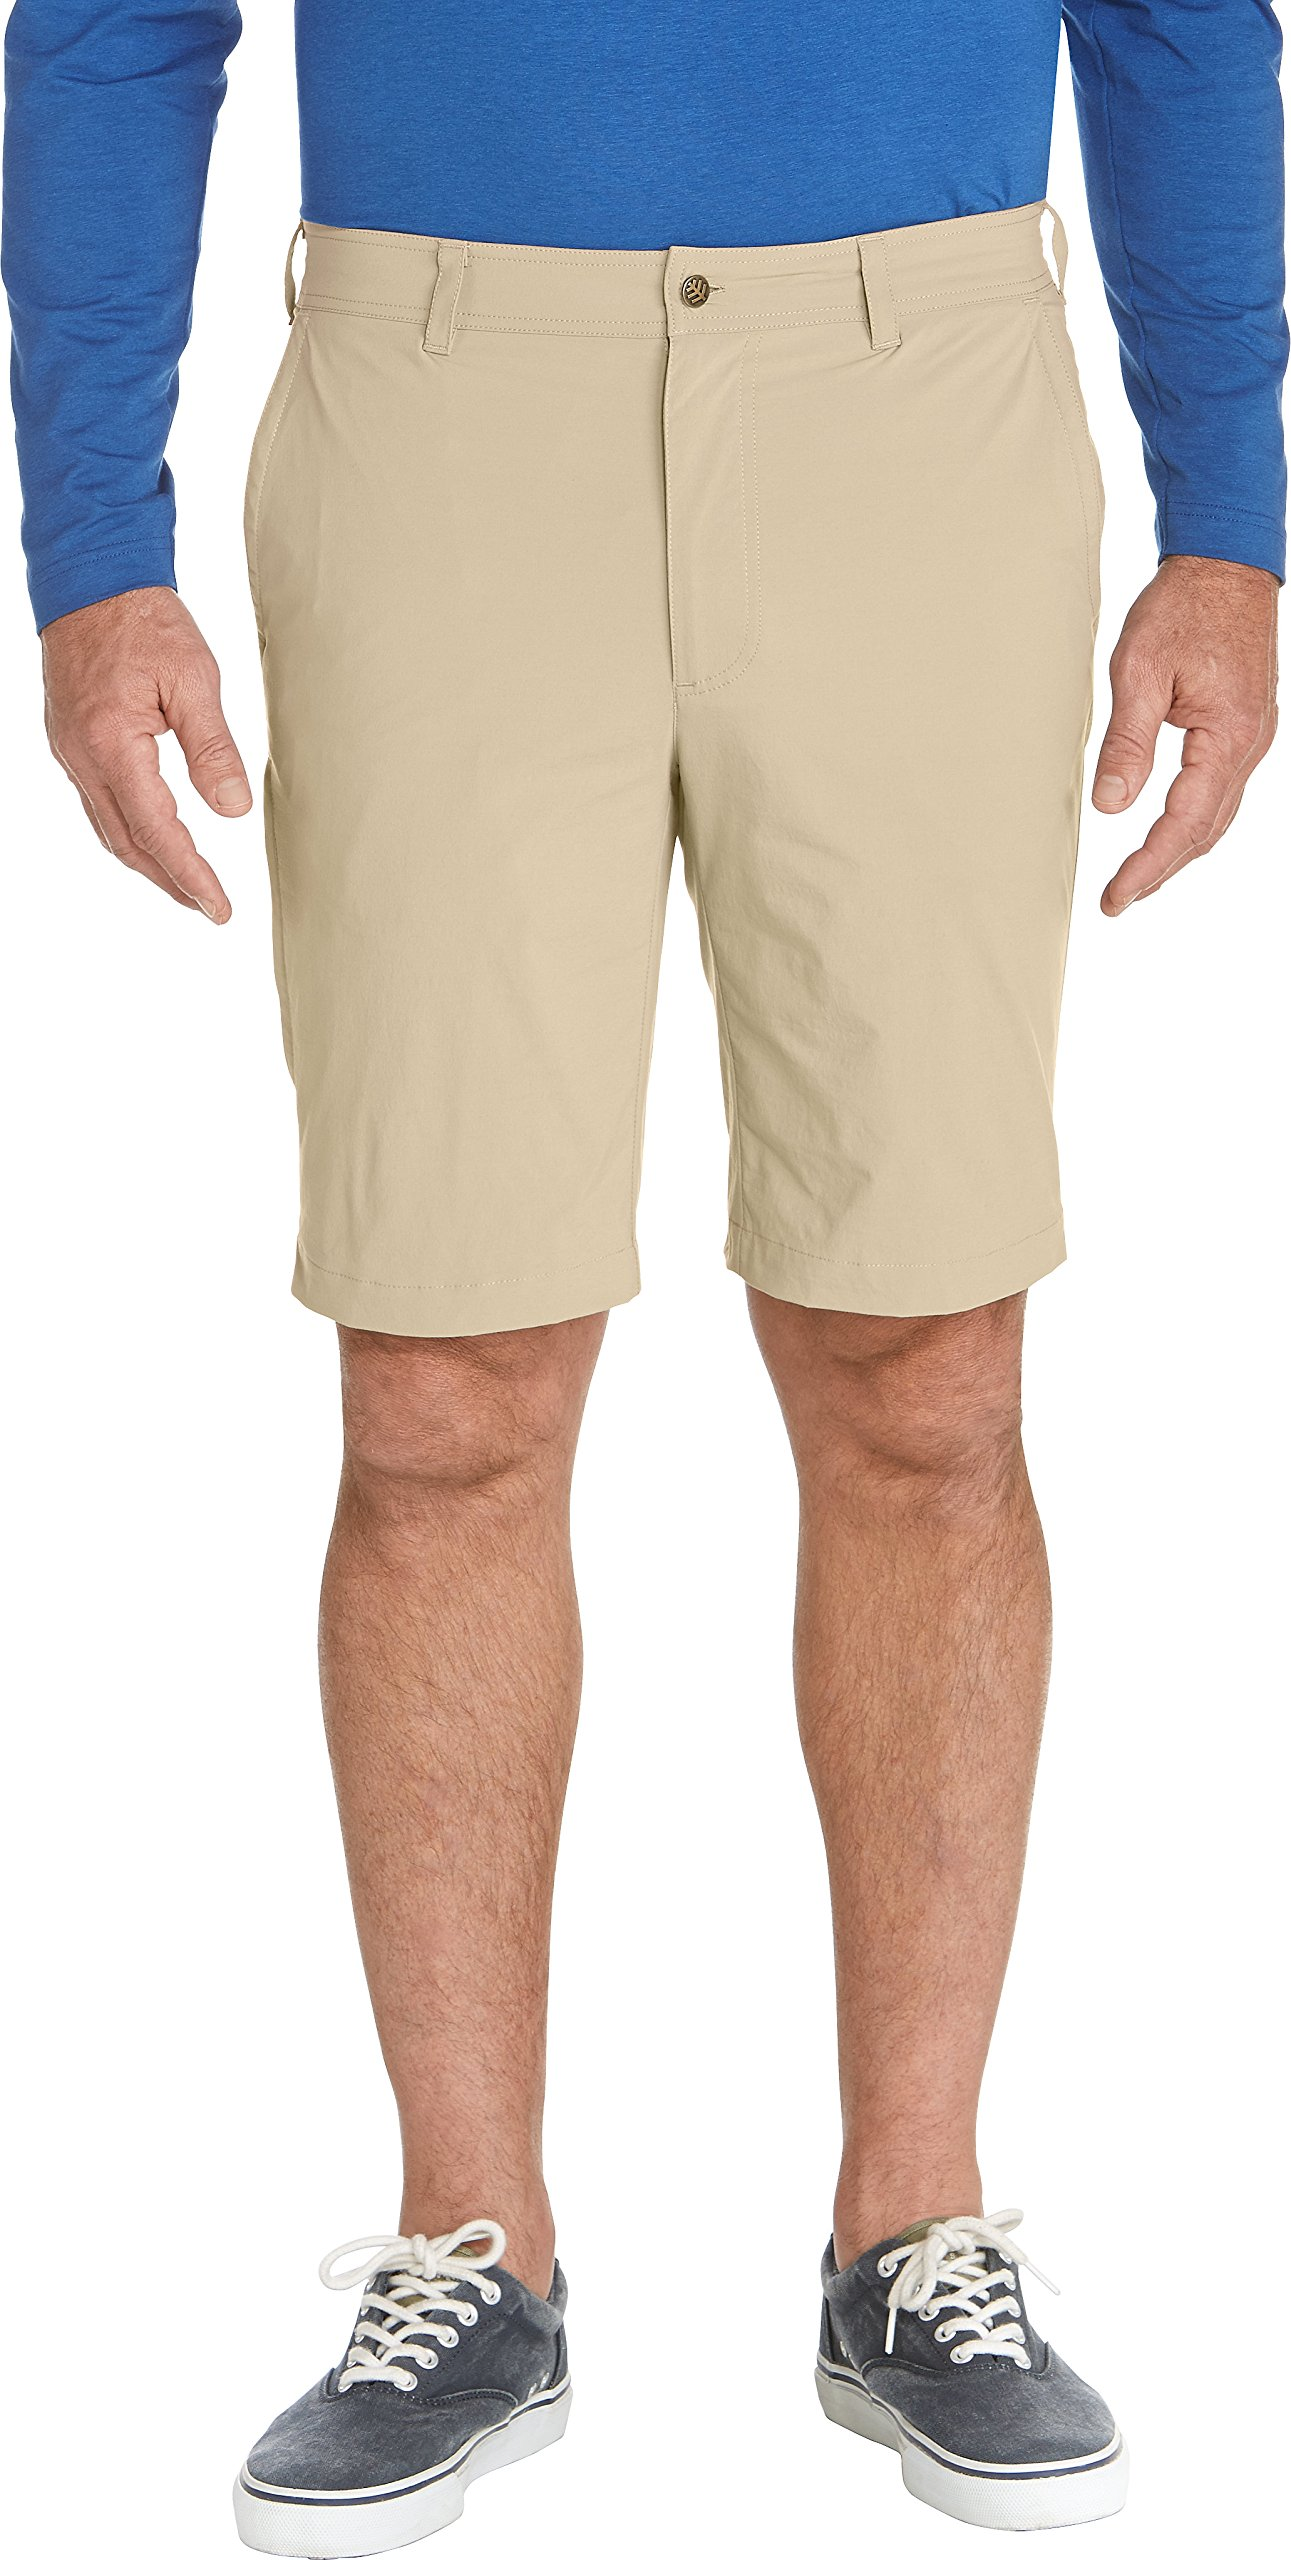 Coolibar UPF 50+ Men's Summer Casual Shorts - Sun Protective (34- Washed Tan)